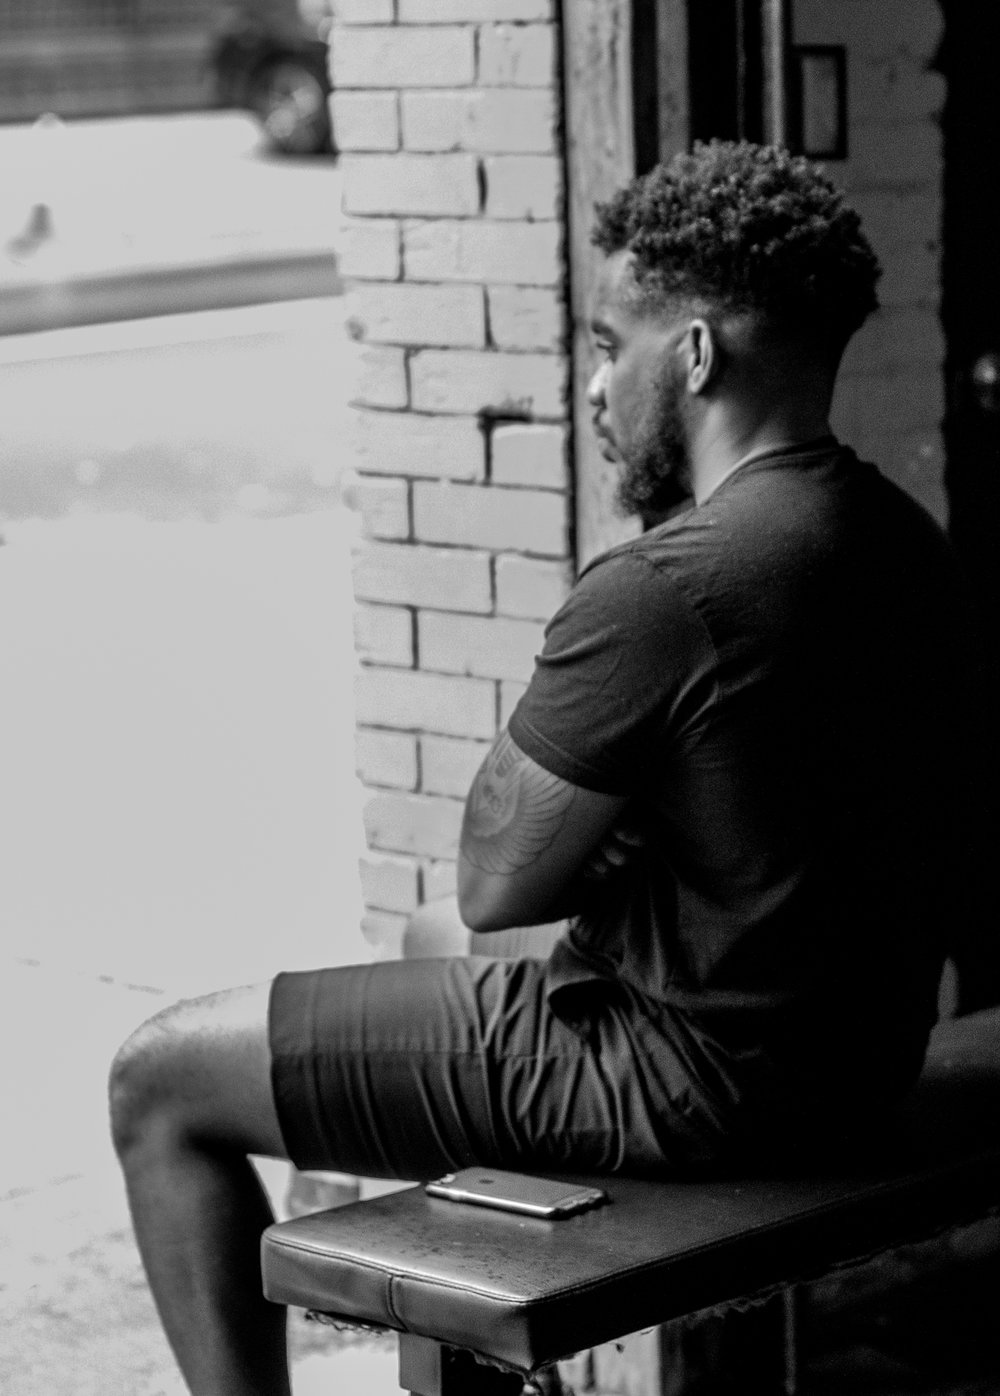 james-wright-visit-brooklyn-new-york-weightlifting-coach-teammates-october-2016 (1 of 92).jpg